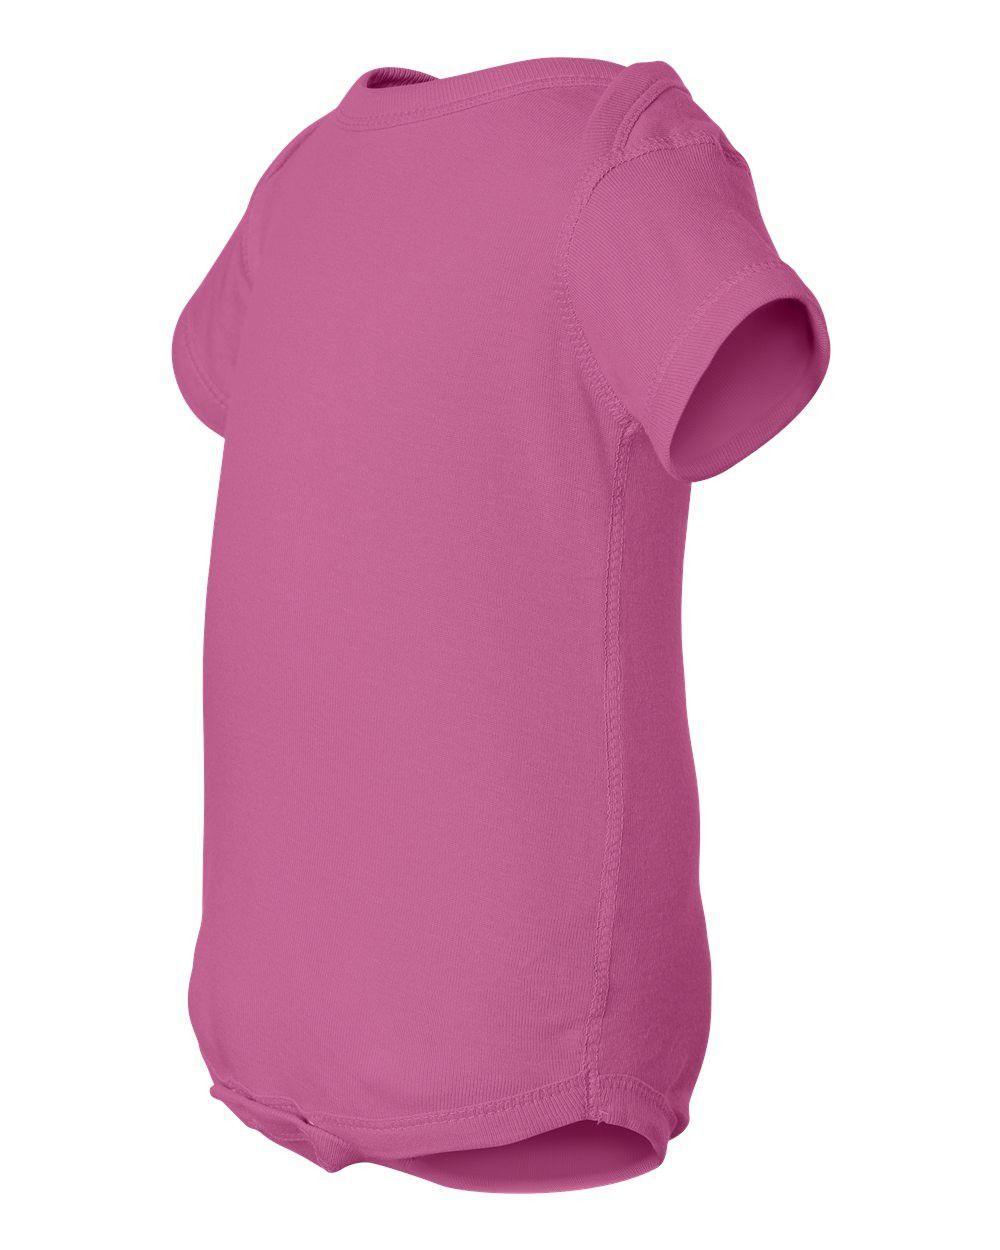 Rabbit Skins - Infant Lap Shoulder Creeper - 4400 (READY TO SHIP)